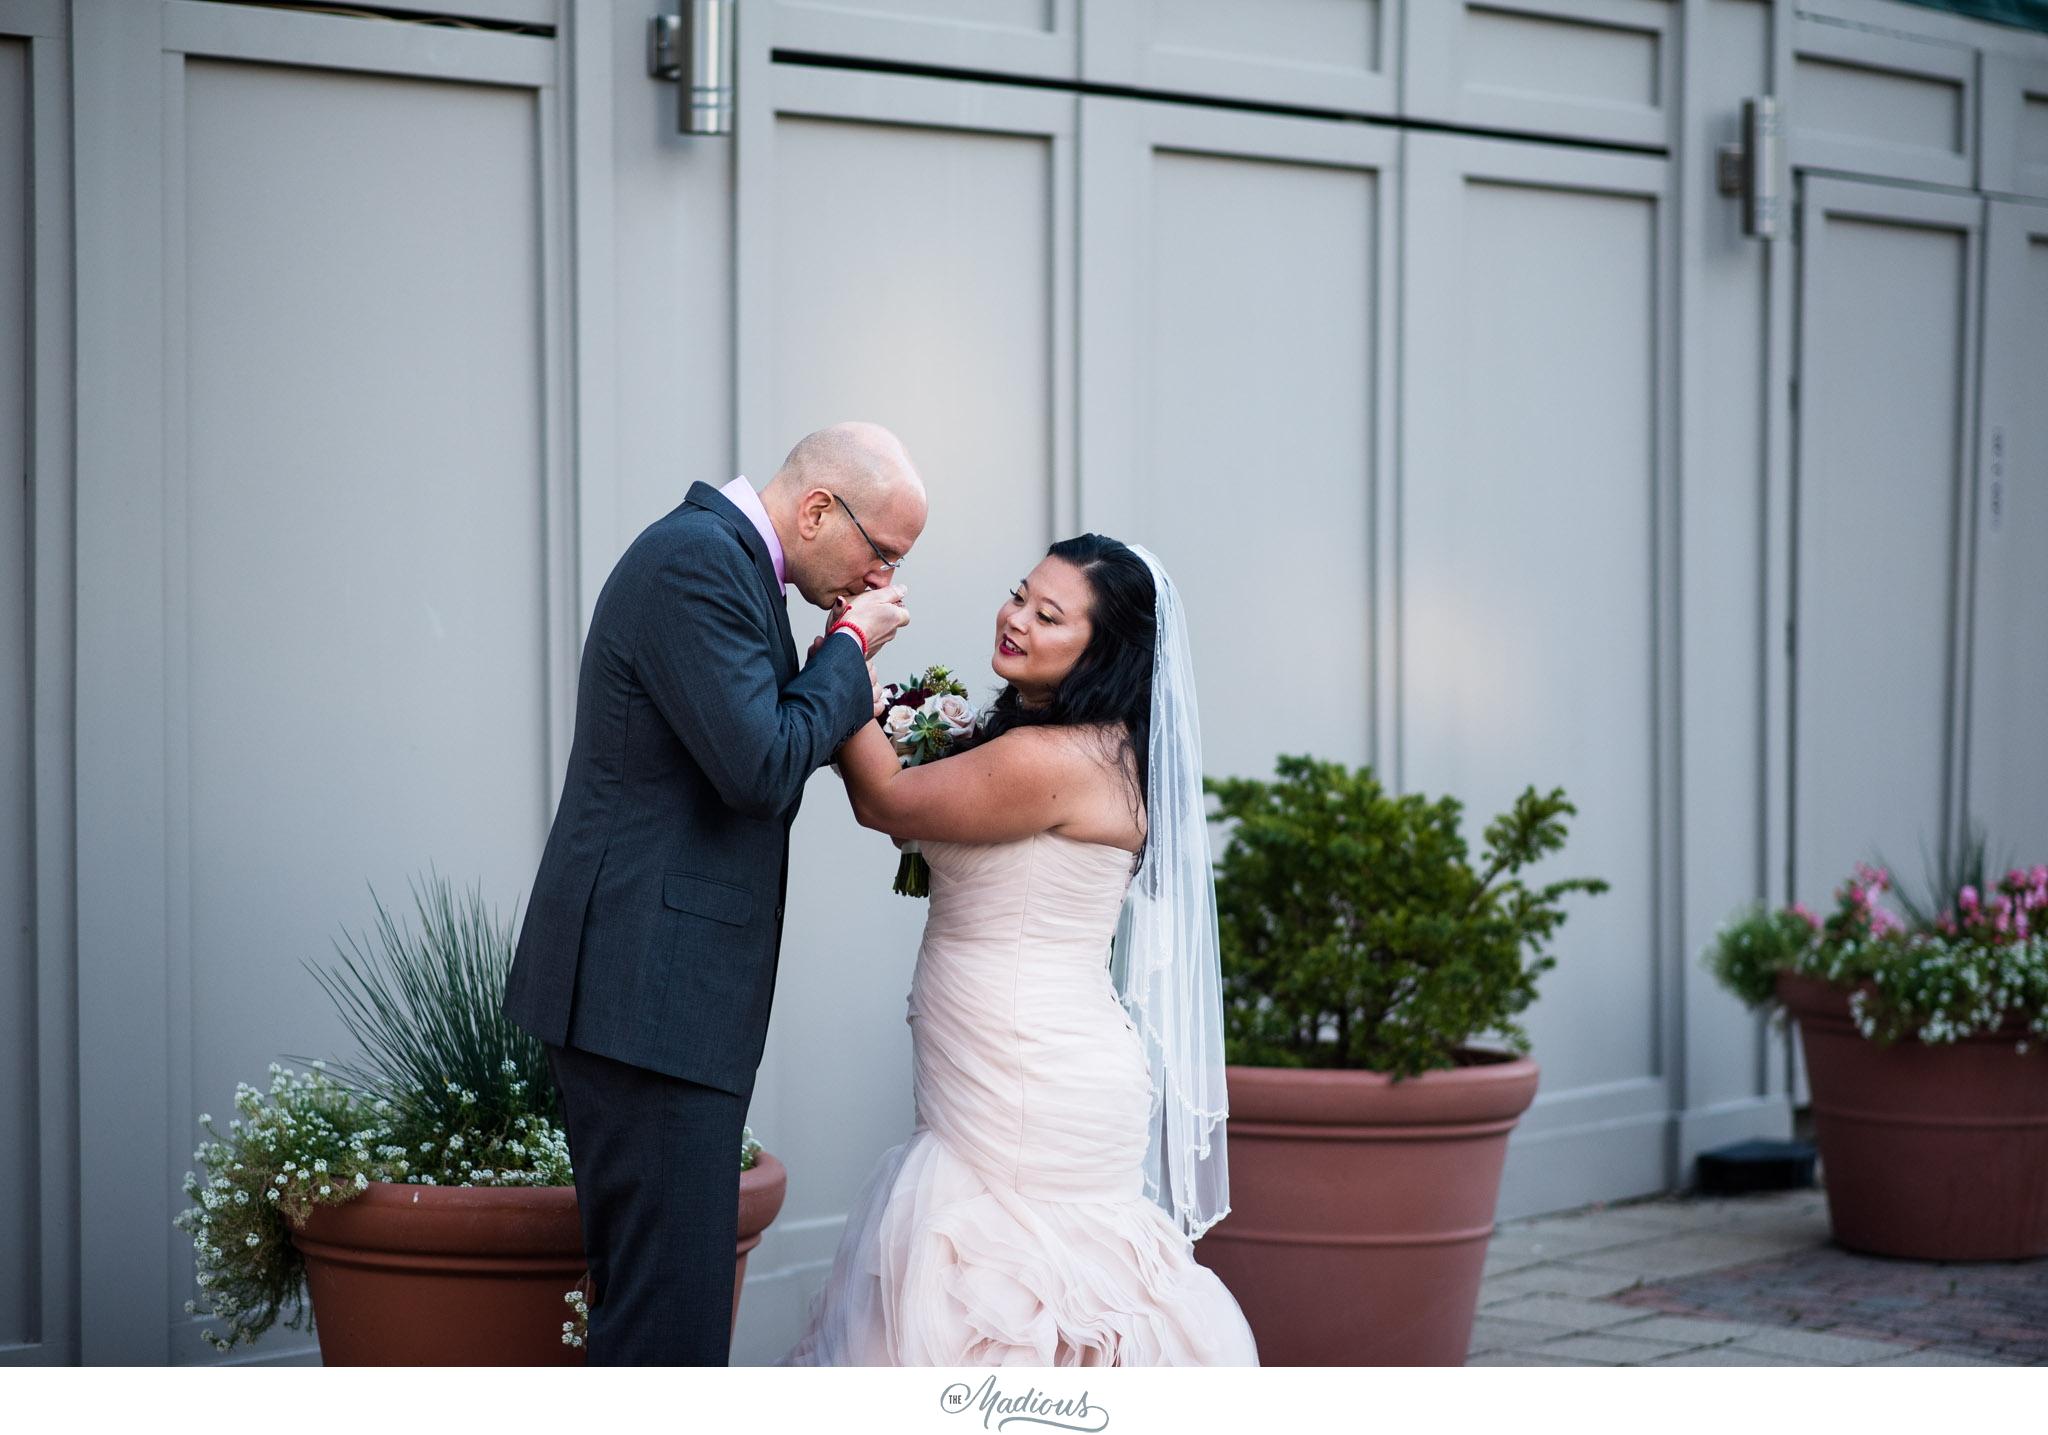 Tabrizis Wedding Baltimore_0027.jpg